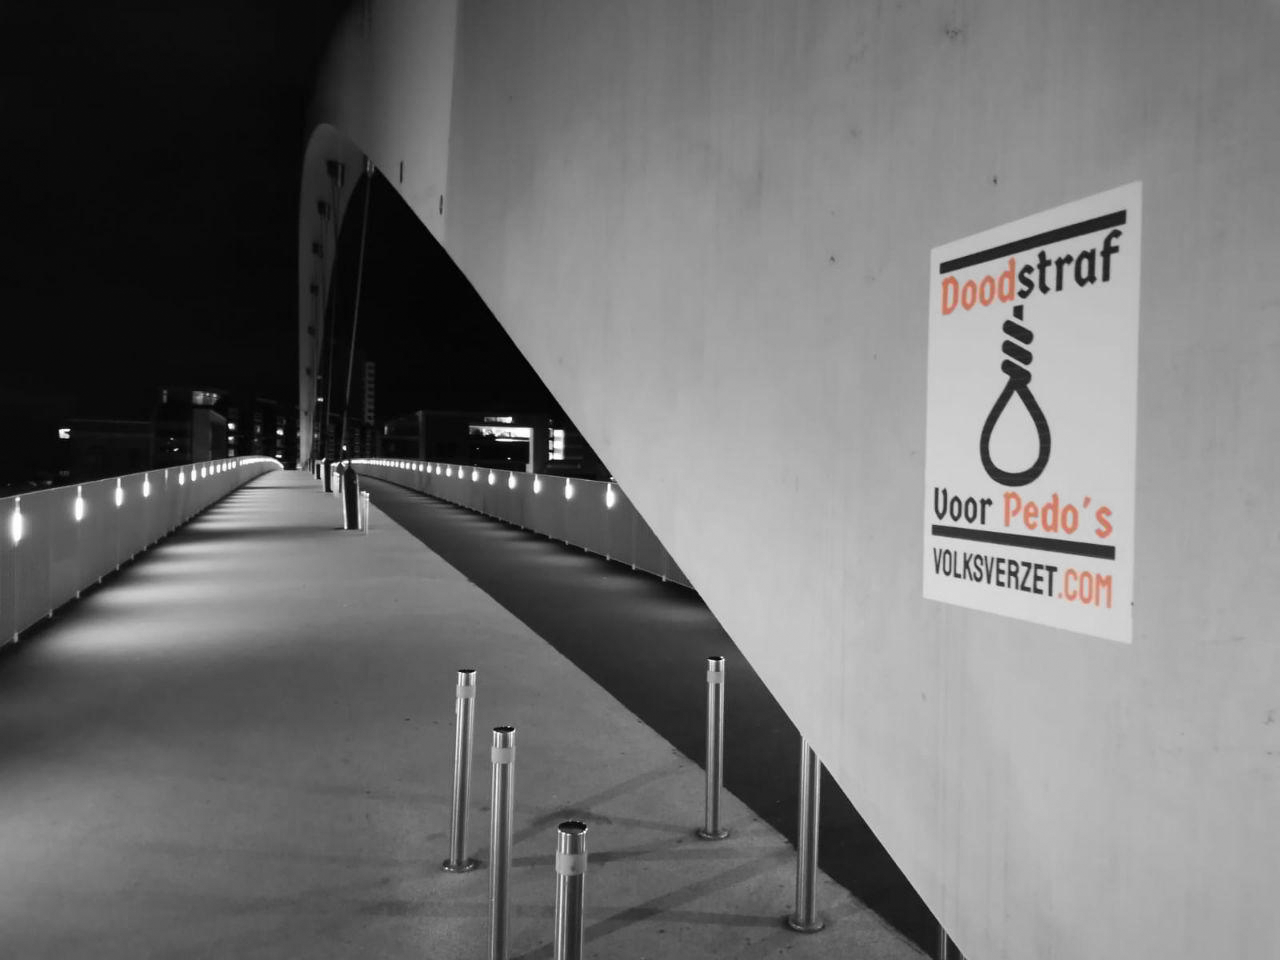 Anti-pedo posters